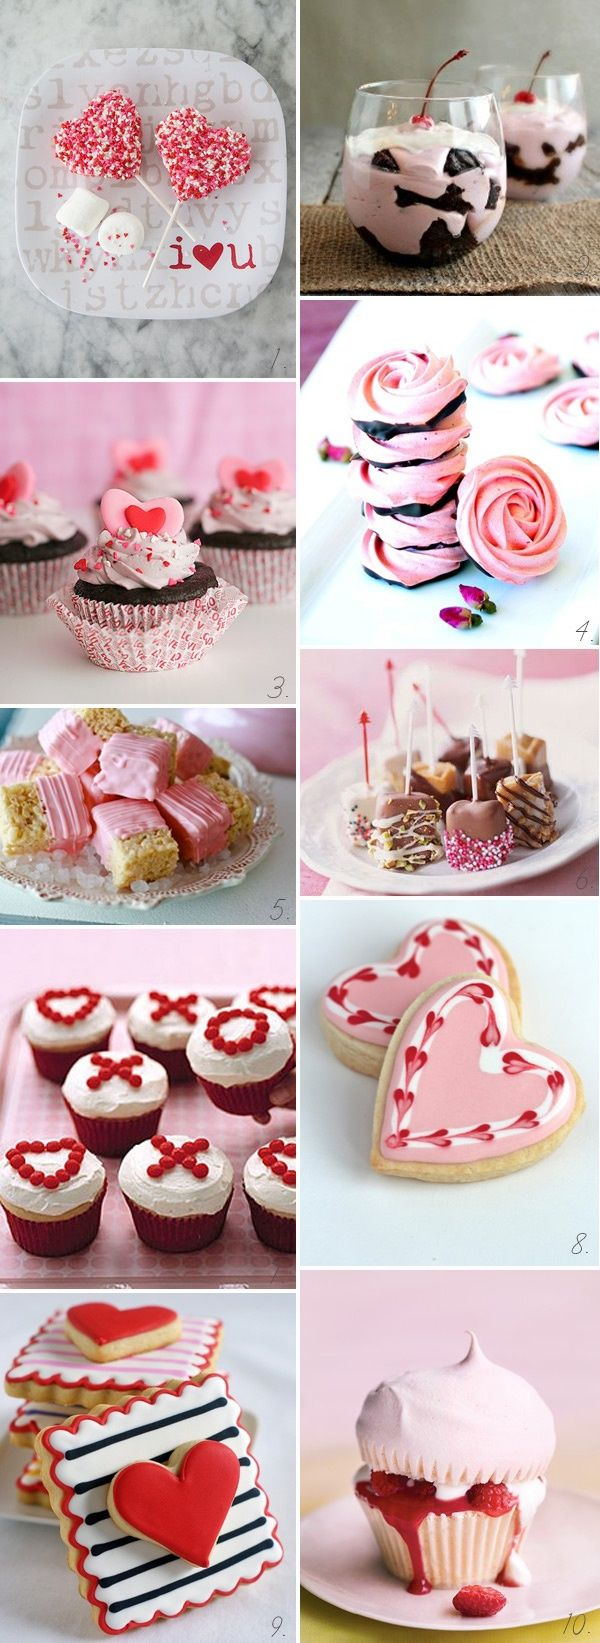 #ValentinesDay #BeMine